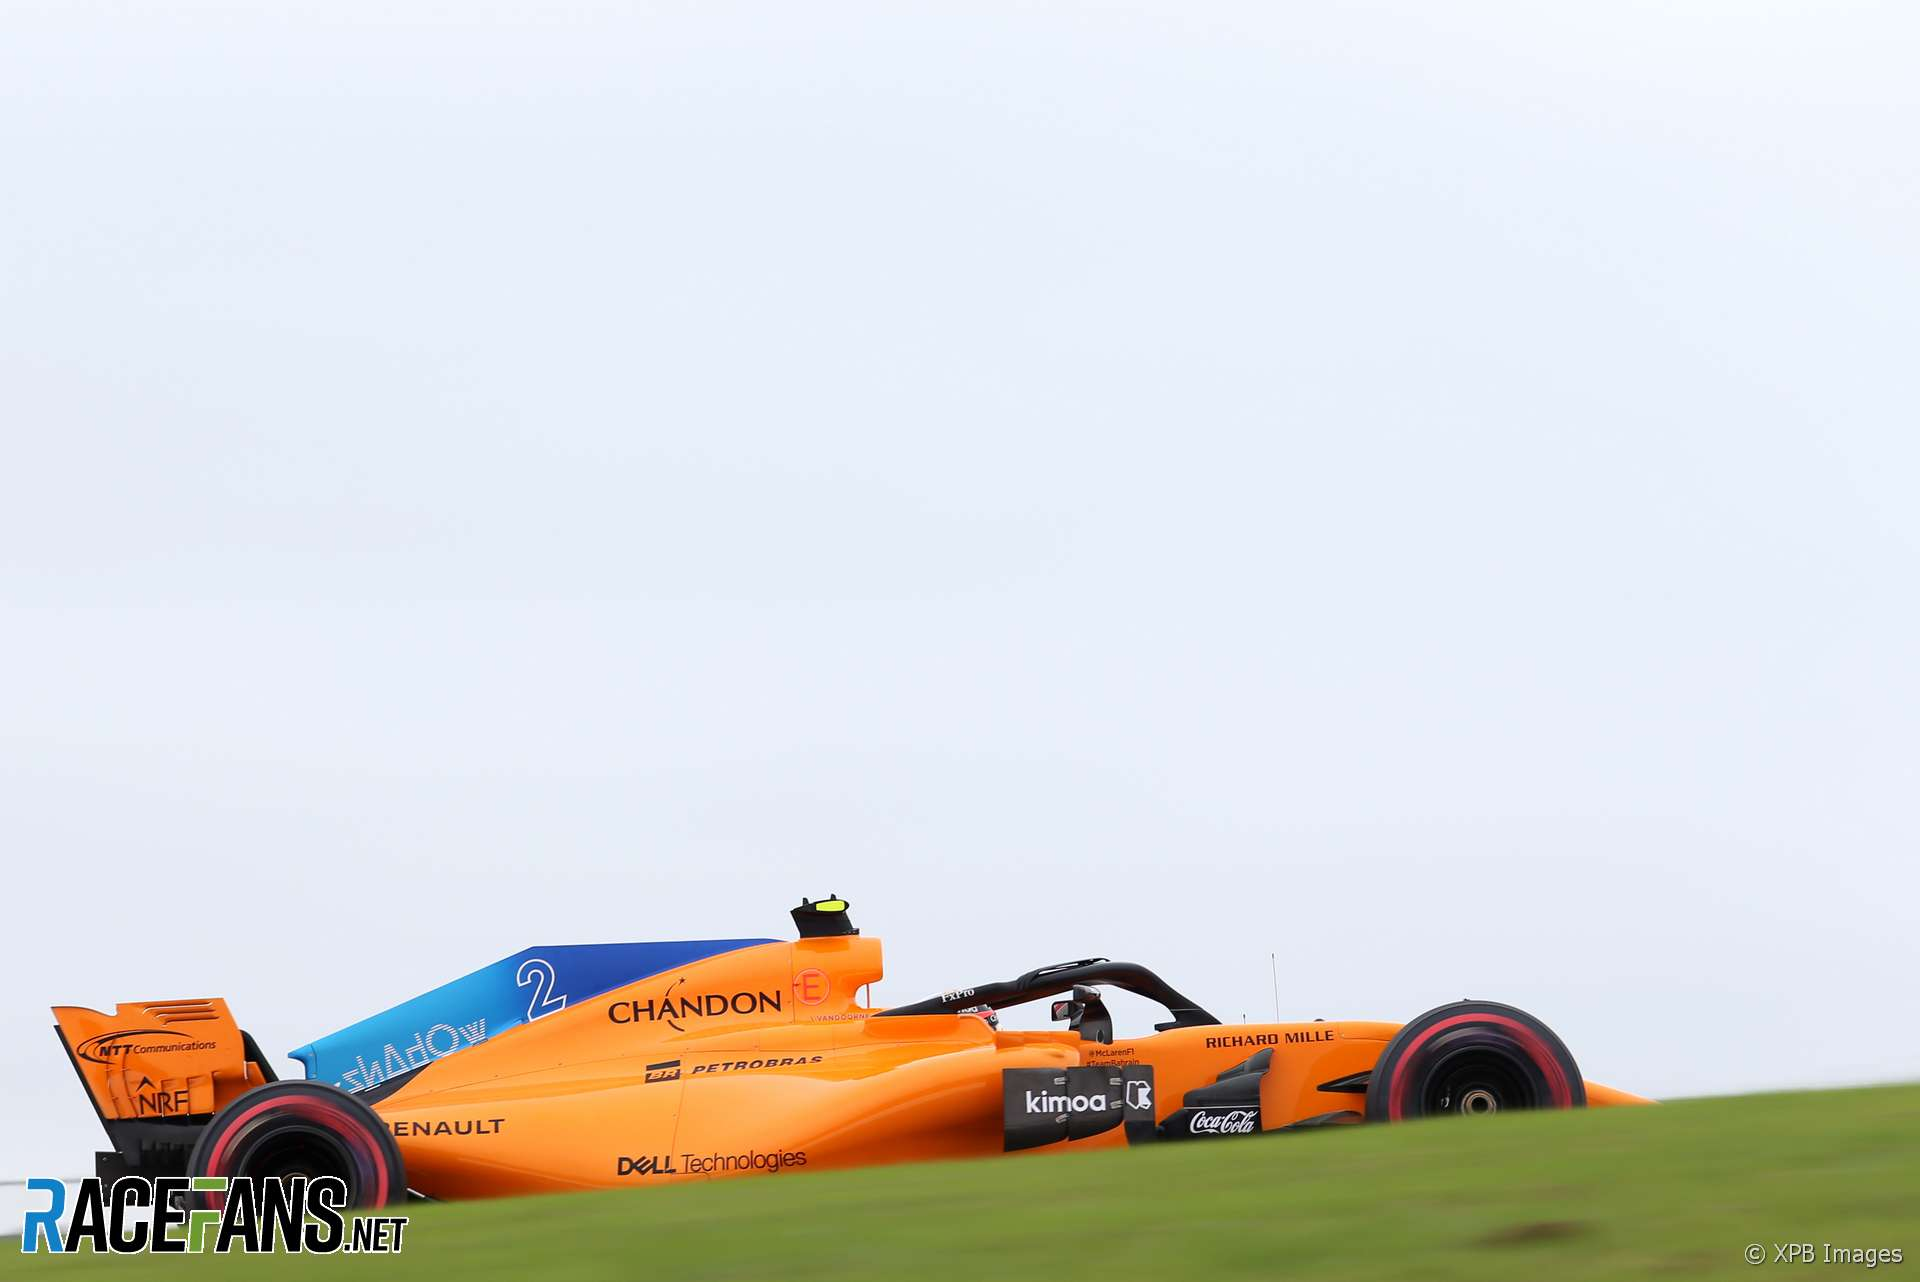 Stoffel Vandoorne, McLaren, Circuit of the Americas, 2018